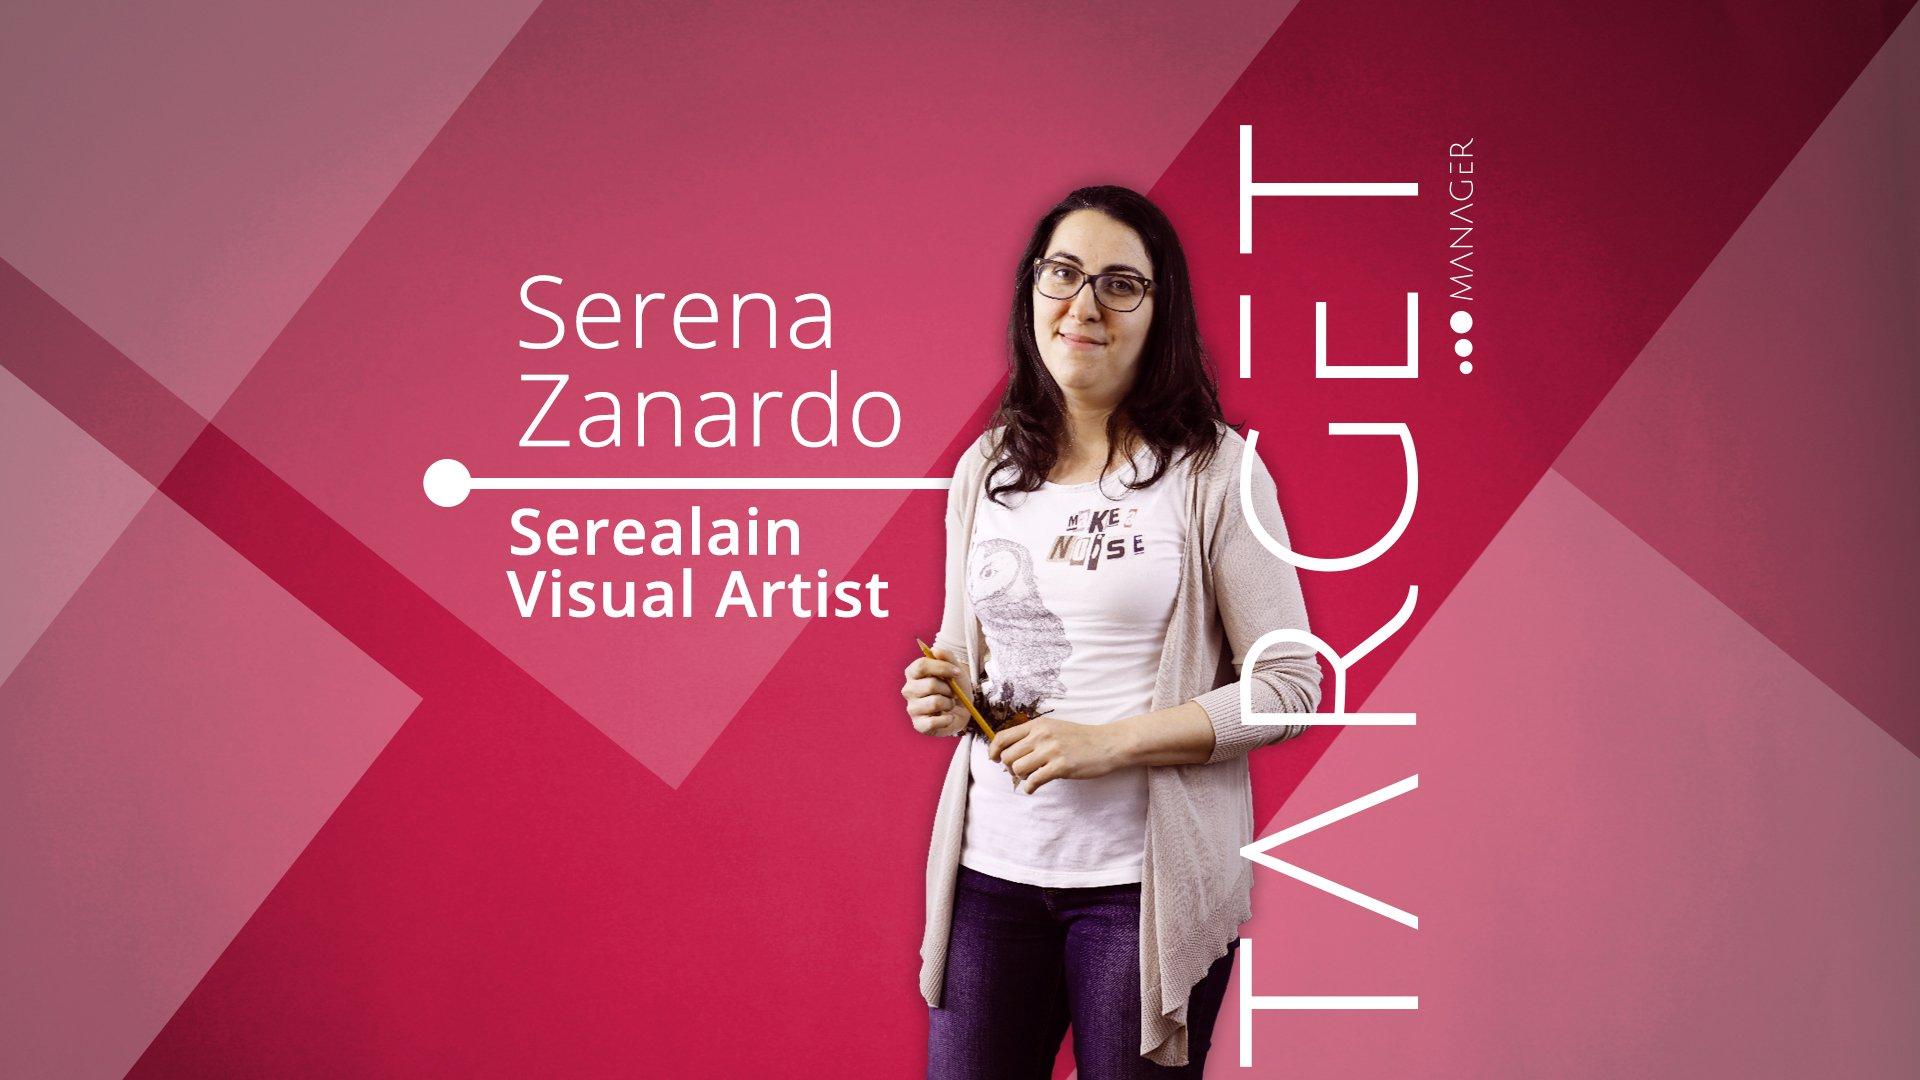 Serena Zanardo